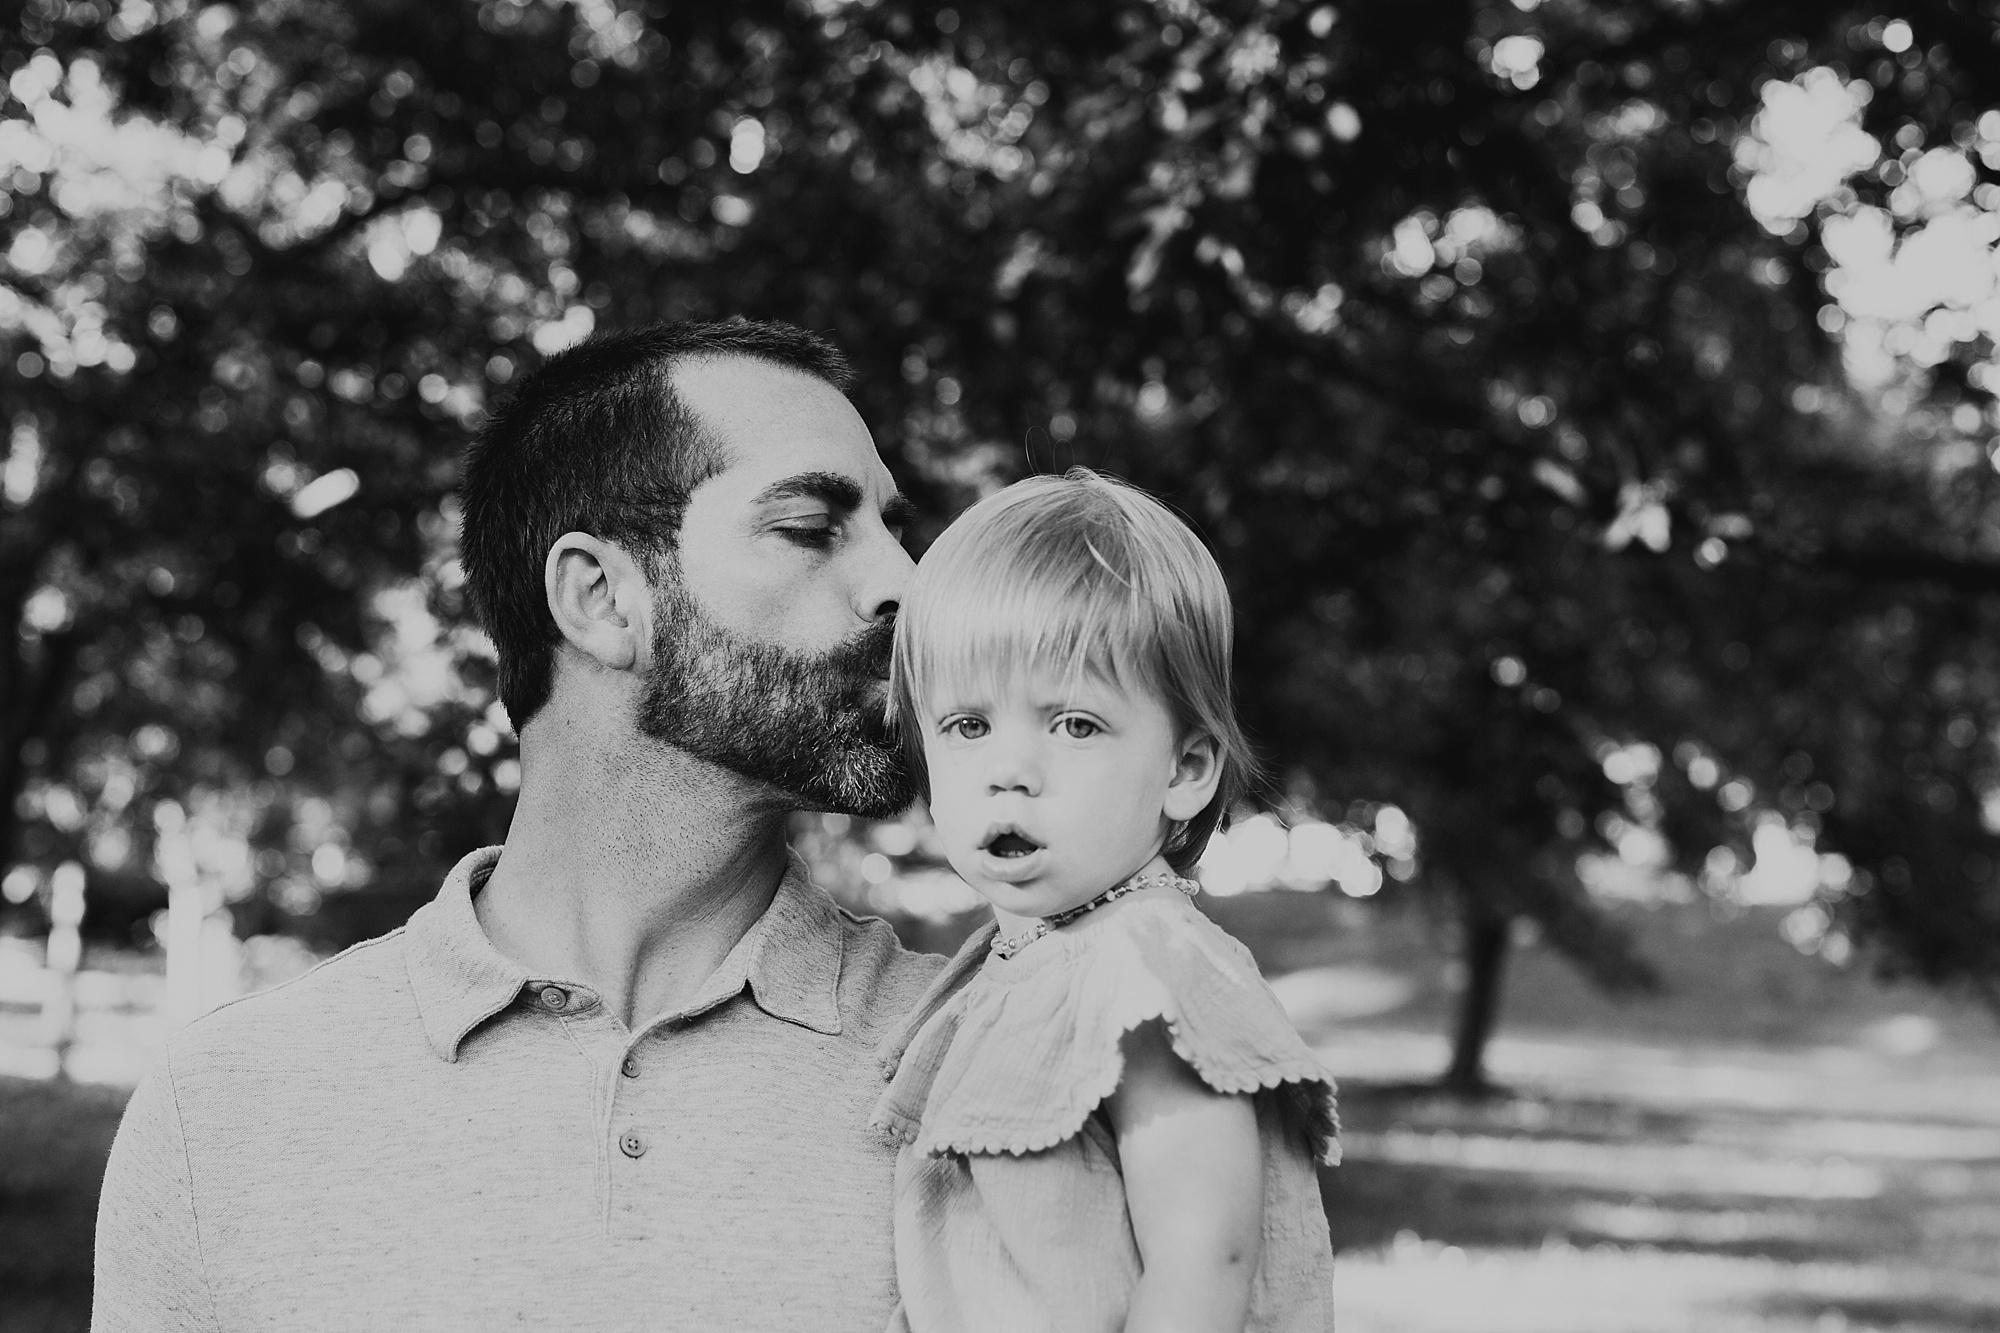 Joe_Mac_Creative_Maternity_West_Chester_Wedding_Photography_Philly_Best_Philadlephia__0121.jpg